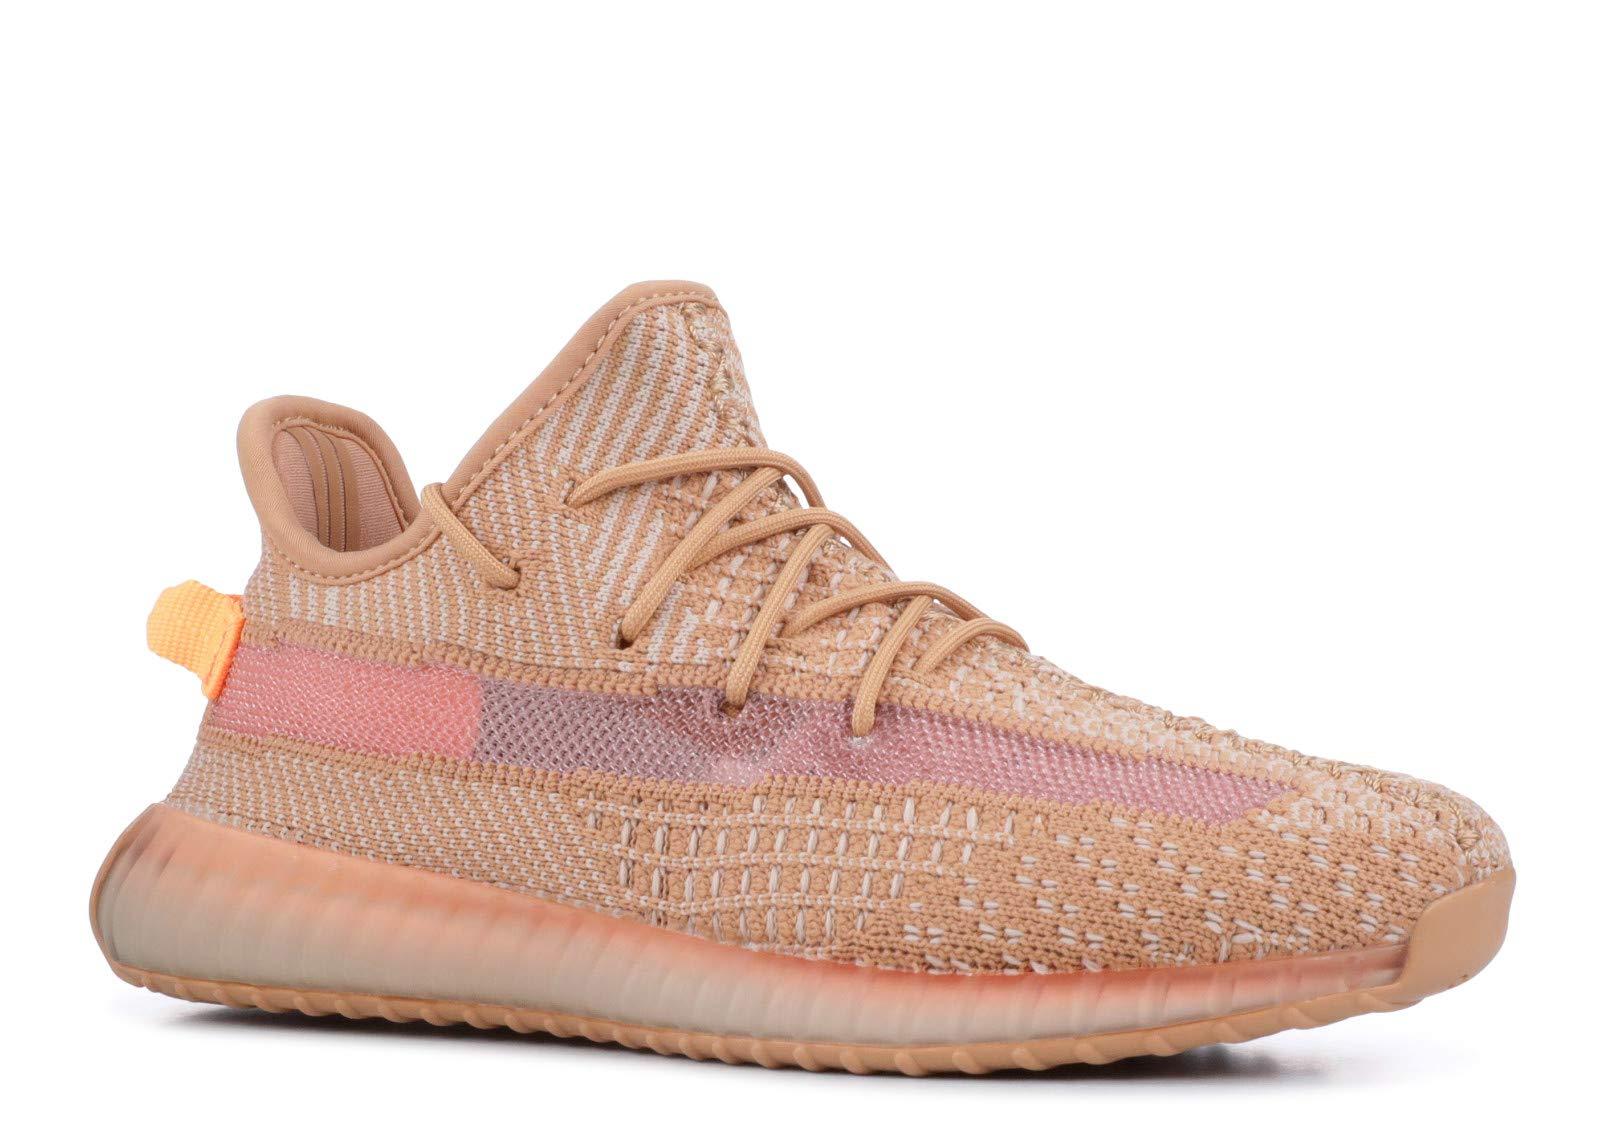 adidas Yeezy Boost 350 V2 Kids 'Clay